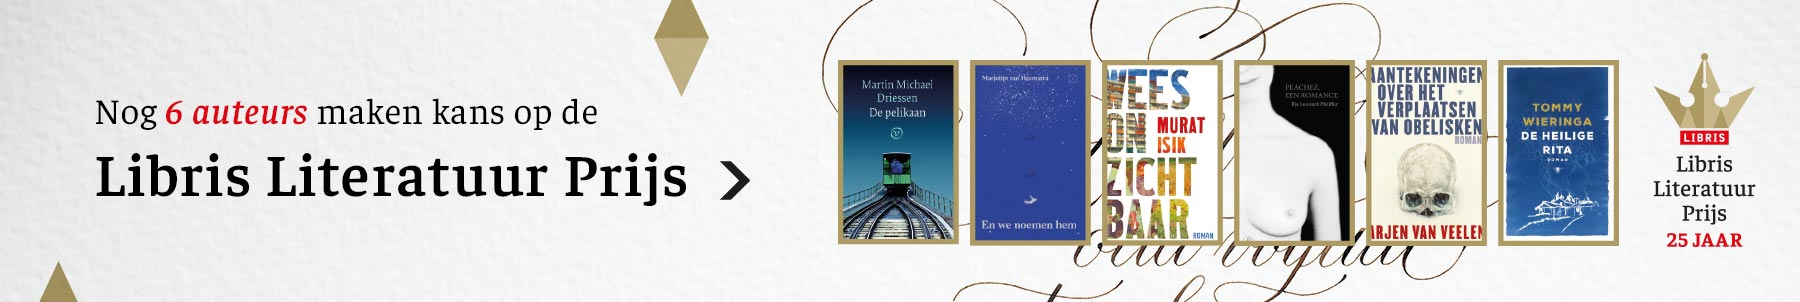 Libris prijs